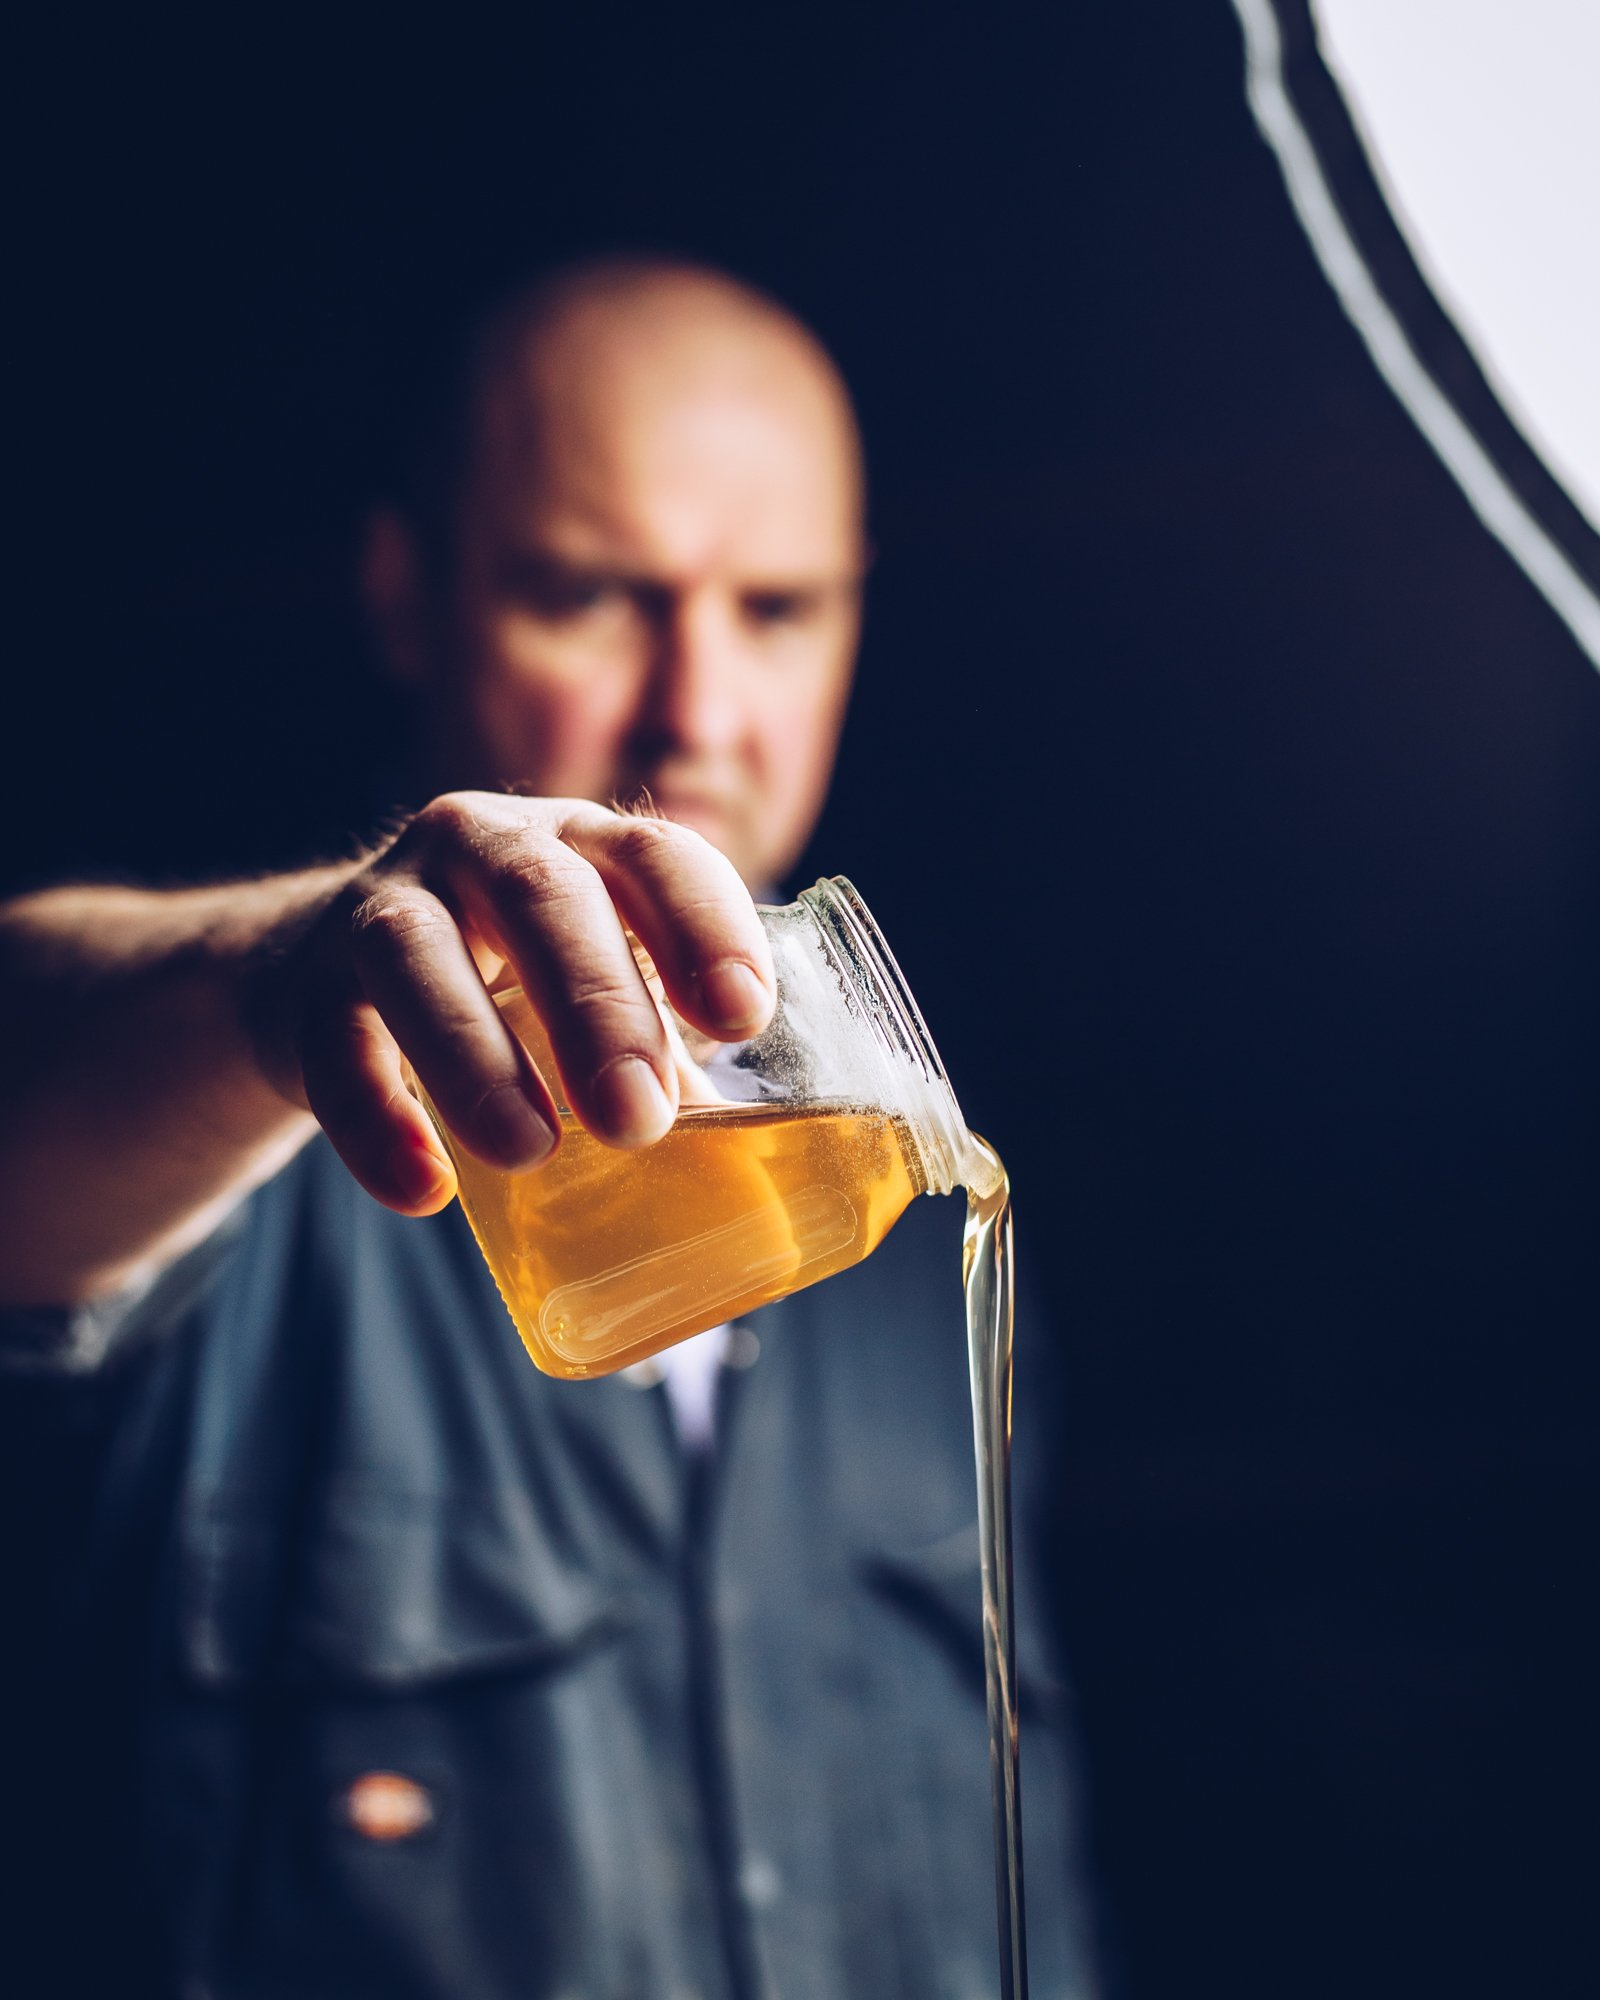 Pouring Honey, National Bee Supplies - OLCO Studios